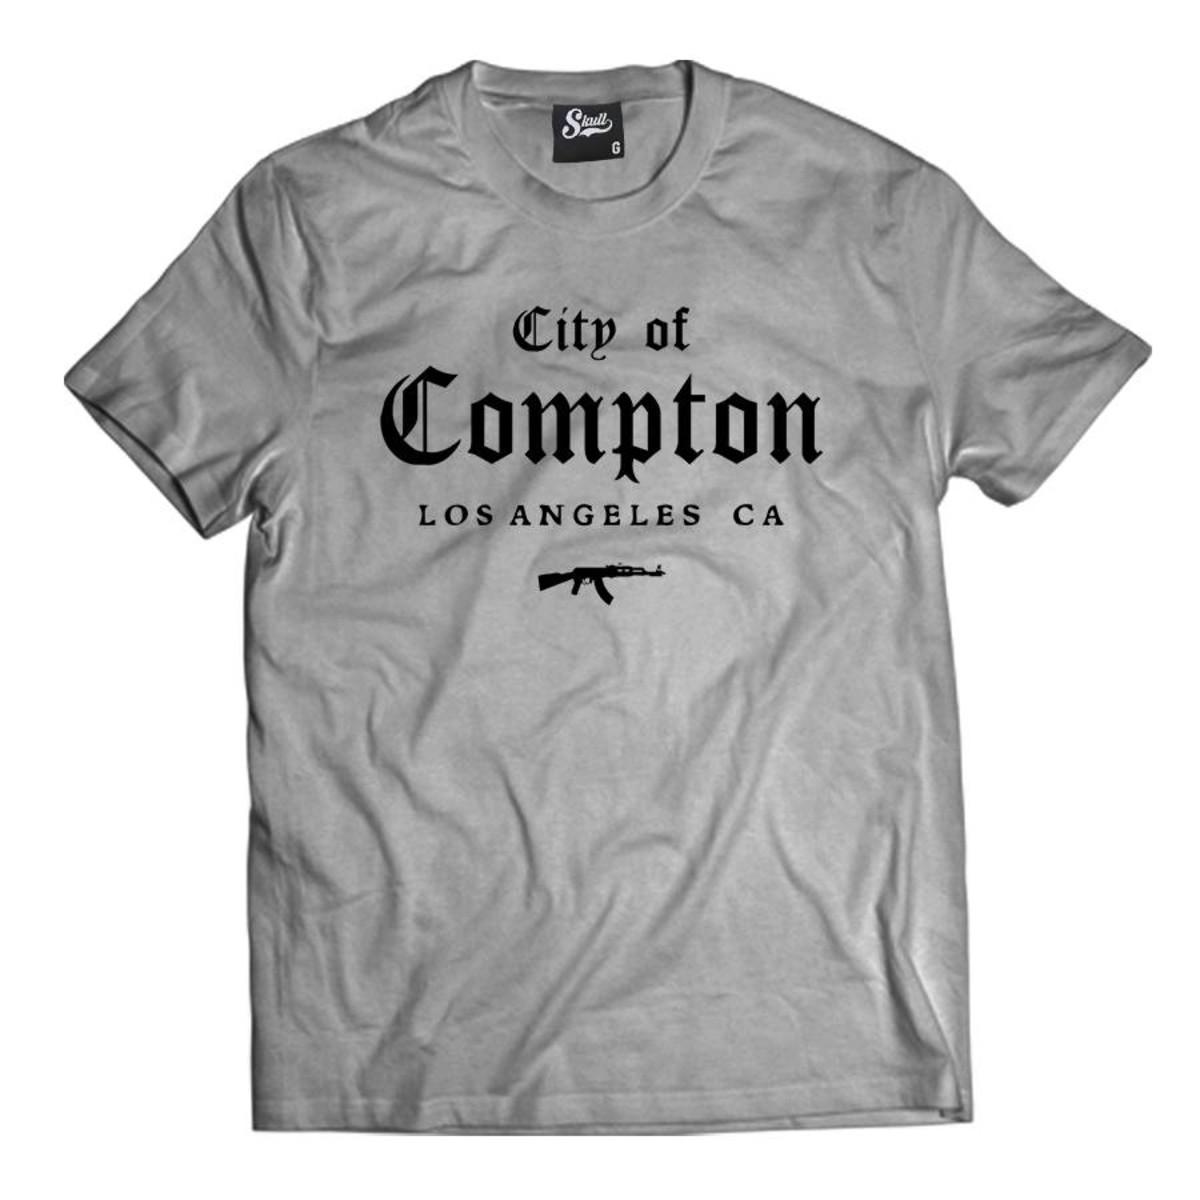 Camiseta City of Compton Camisa Masculina Gangster Hip-hop no Elo7 ... 5ac0c3bea30